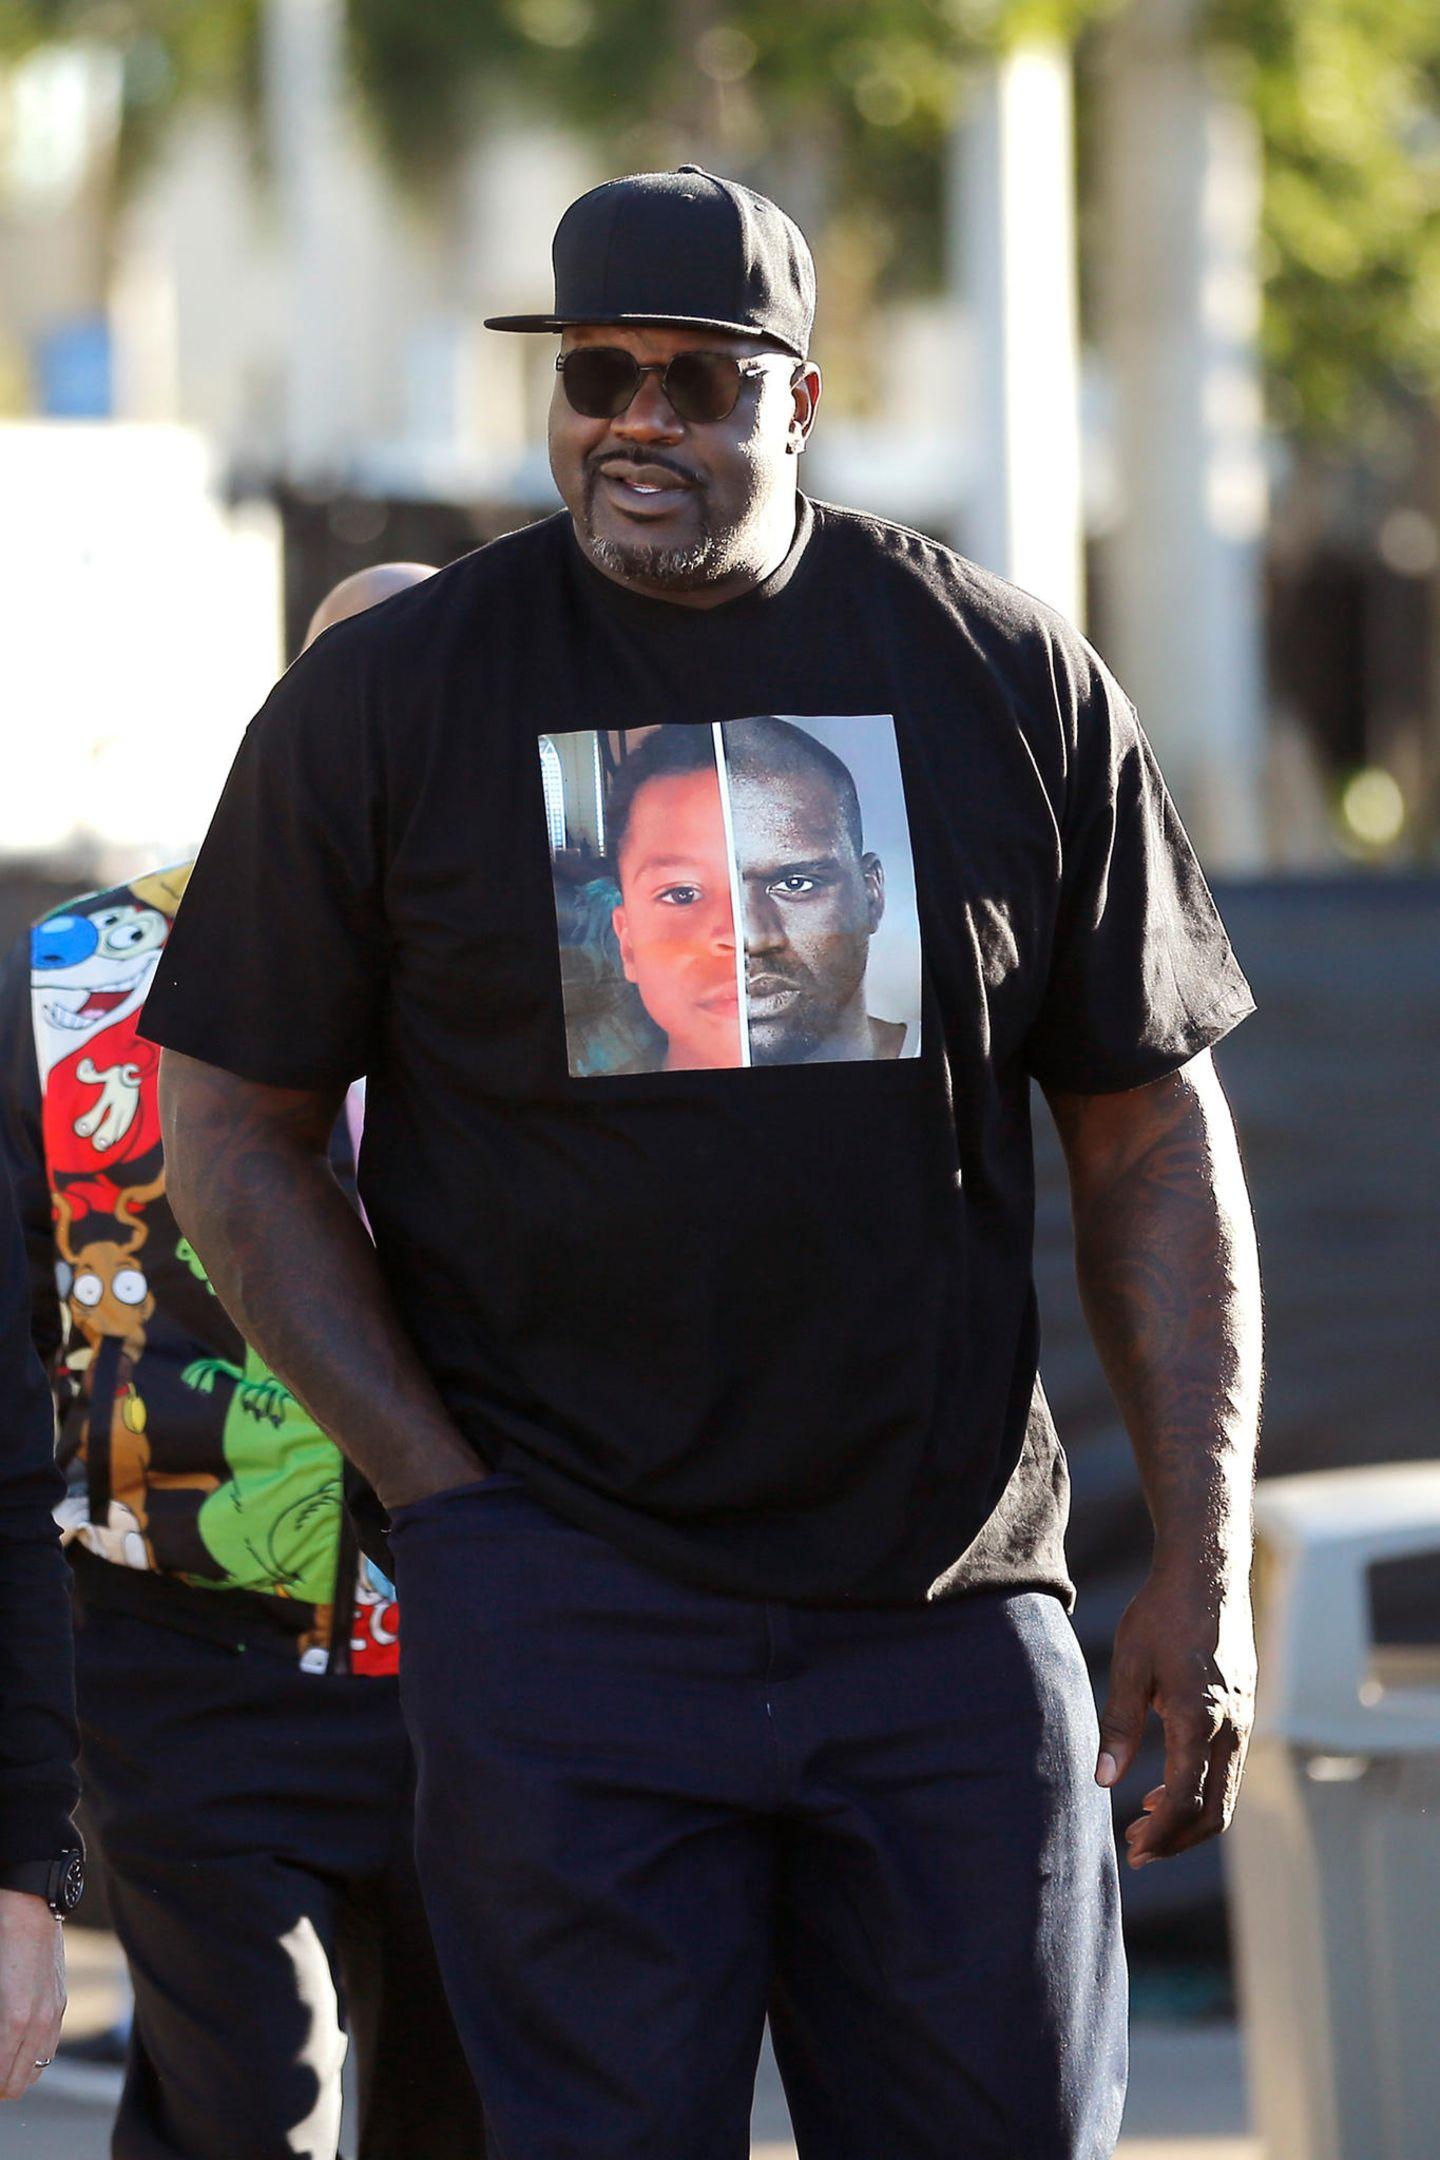 Auch Basketball-LegendeShaquille O'Neal ist großer Football-Fan.